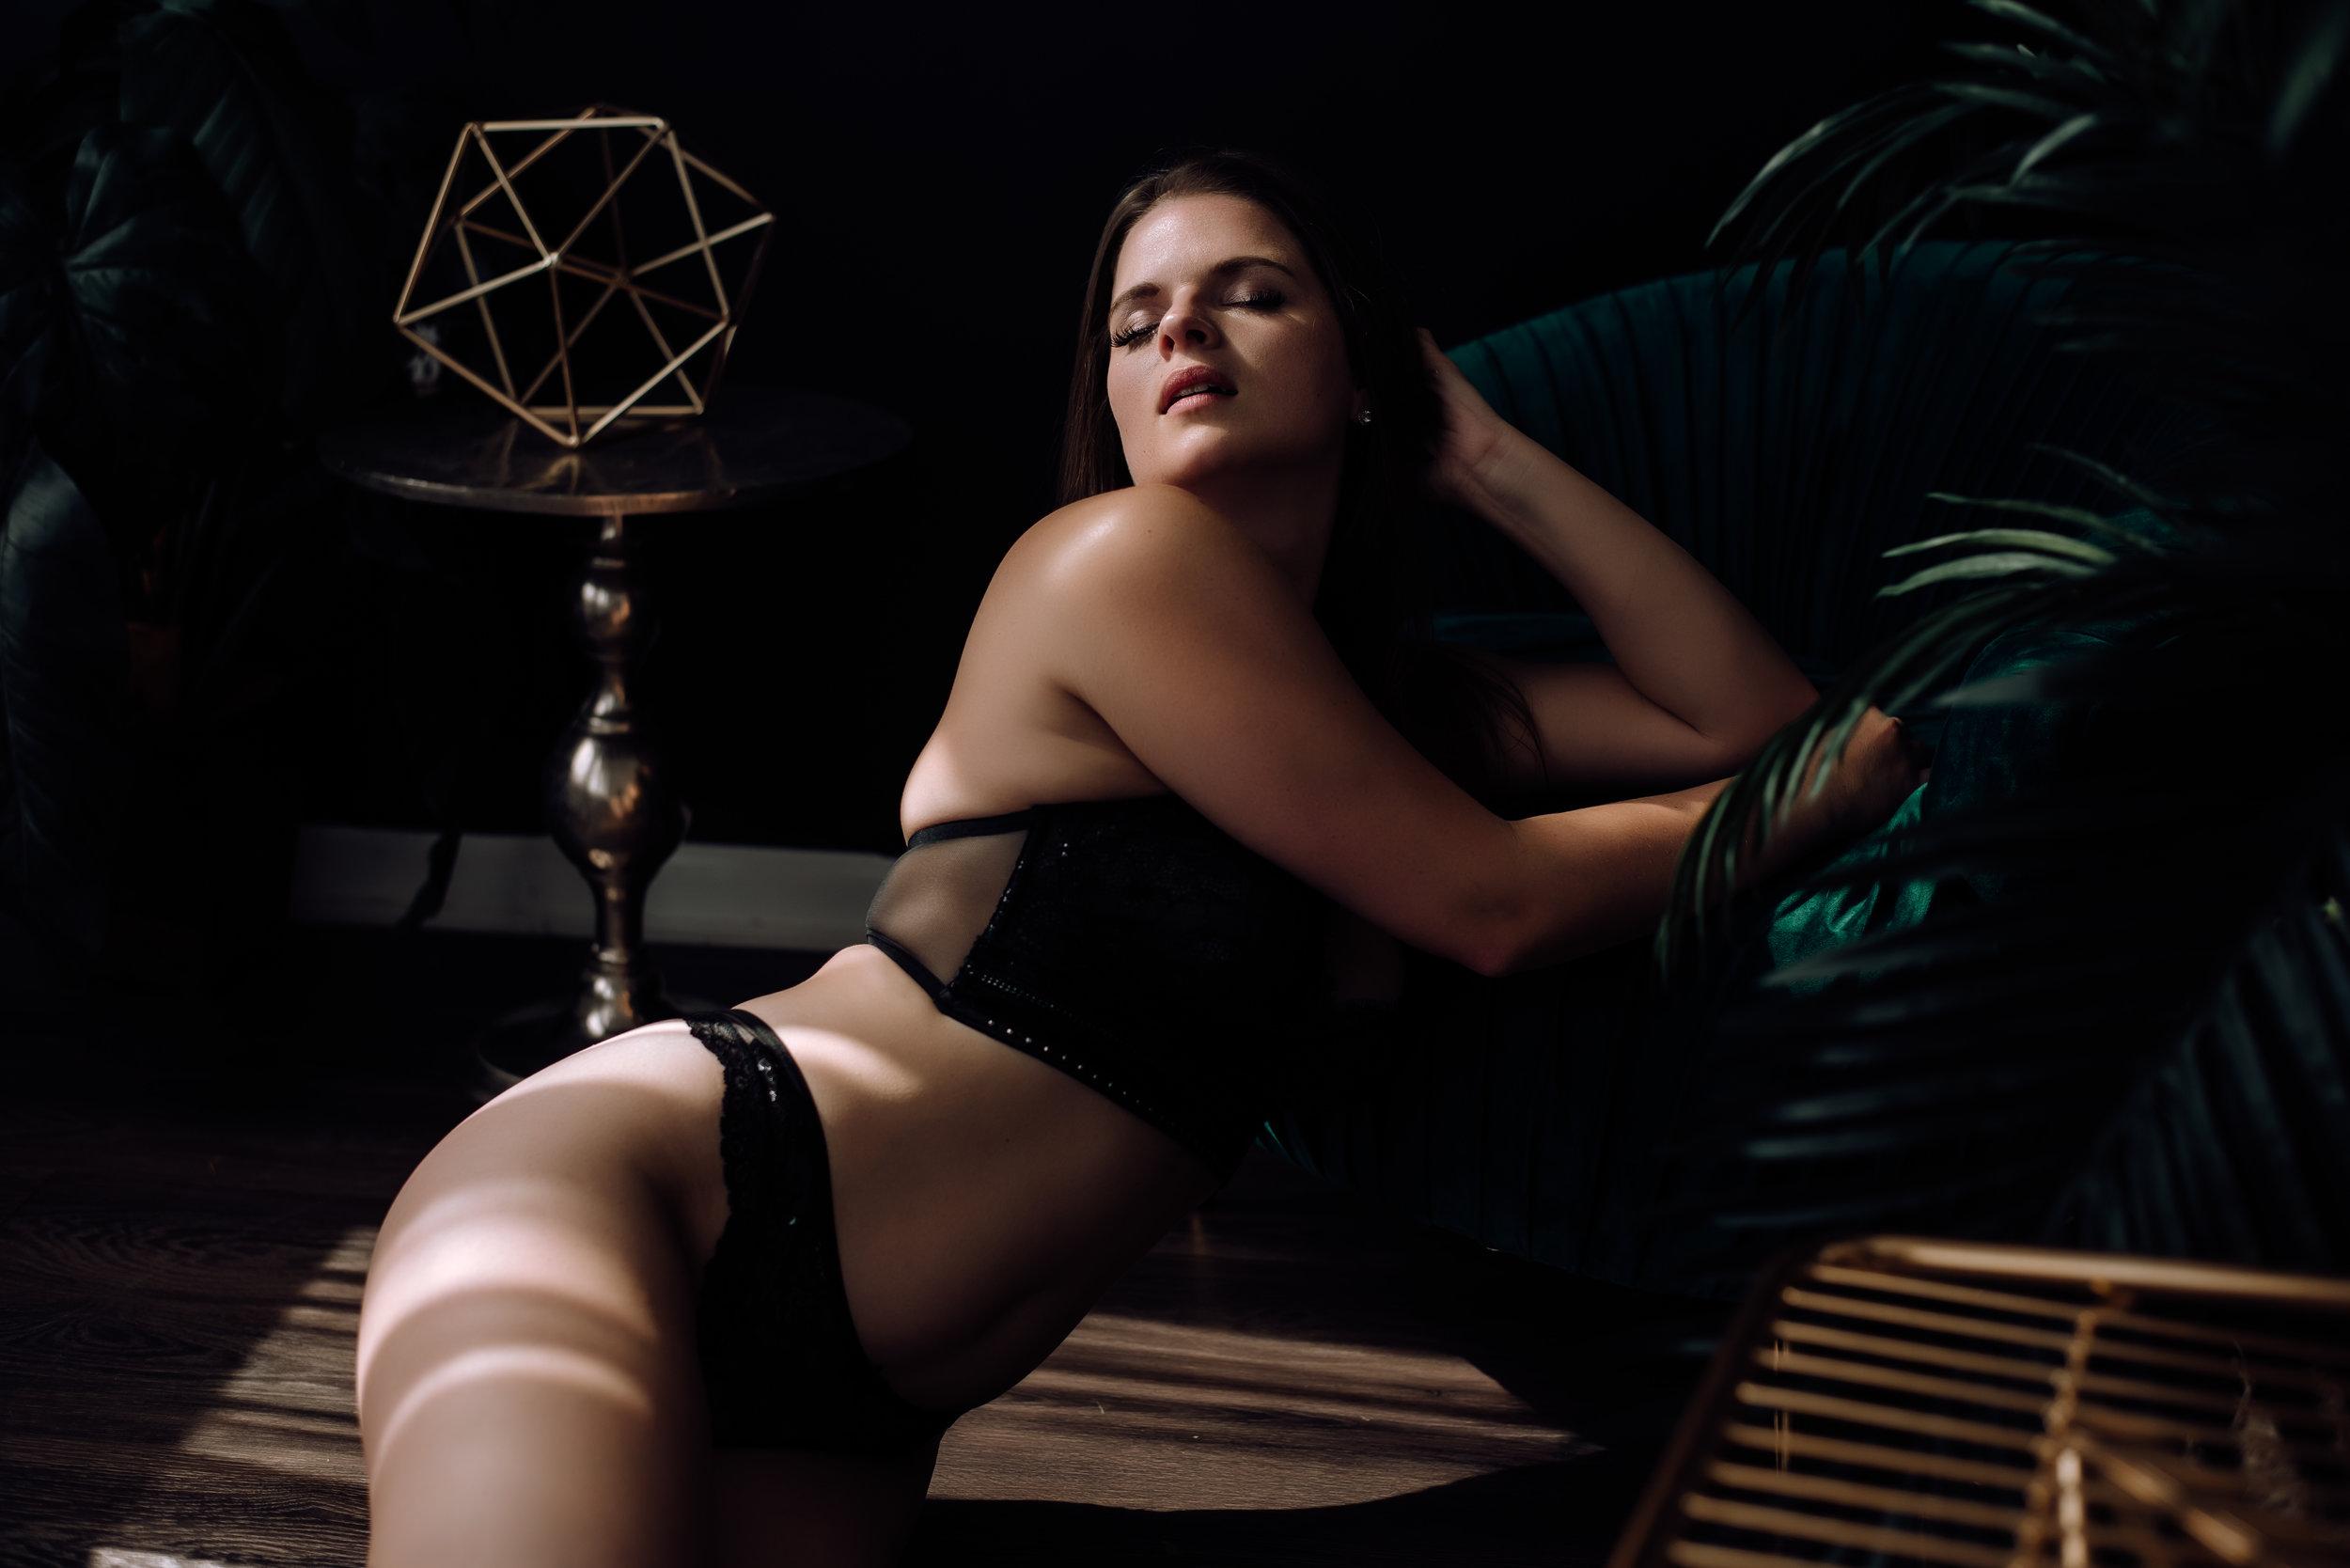 boudoir-photography-best-in-berks-9.jpg